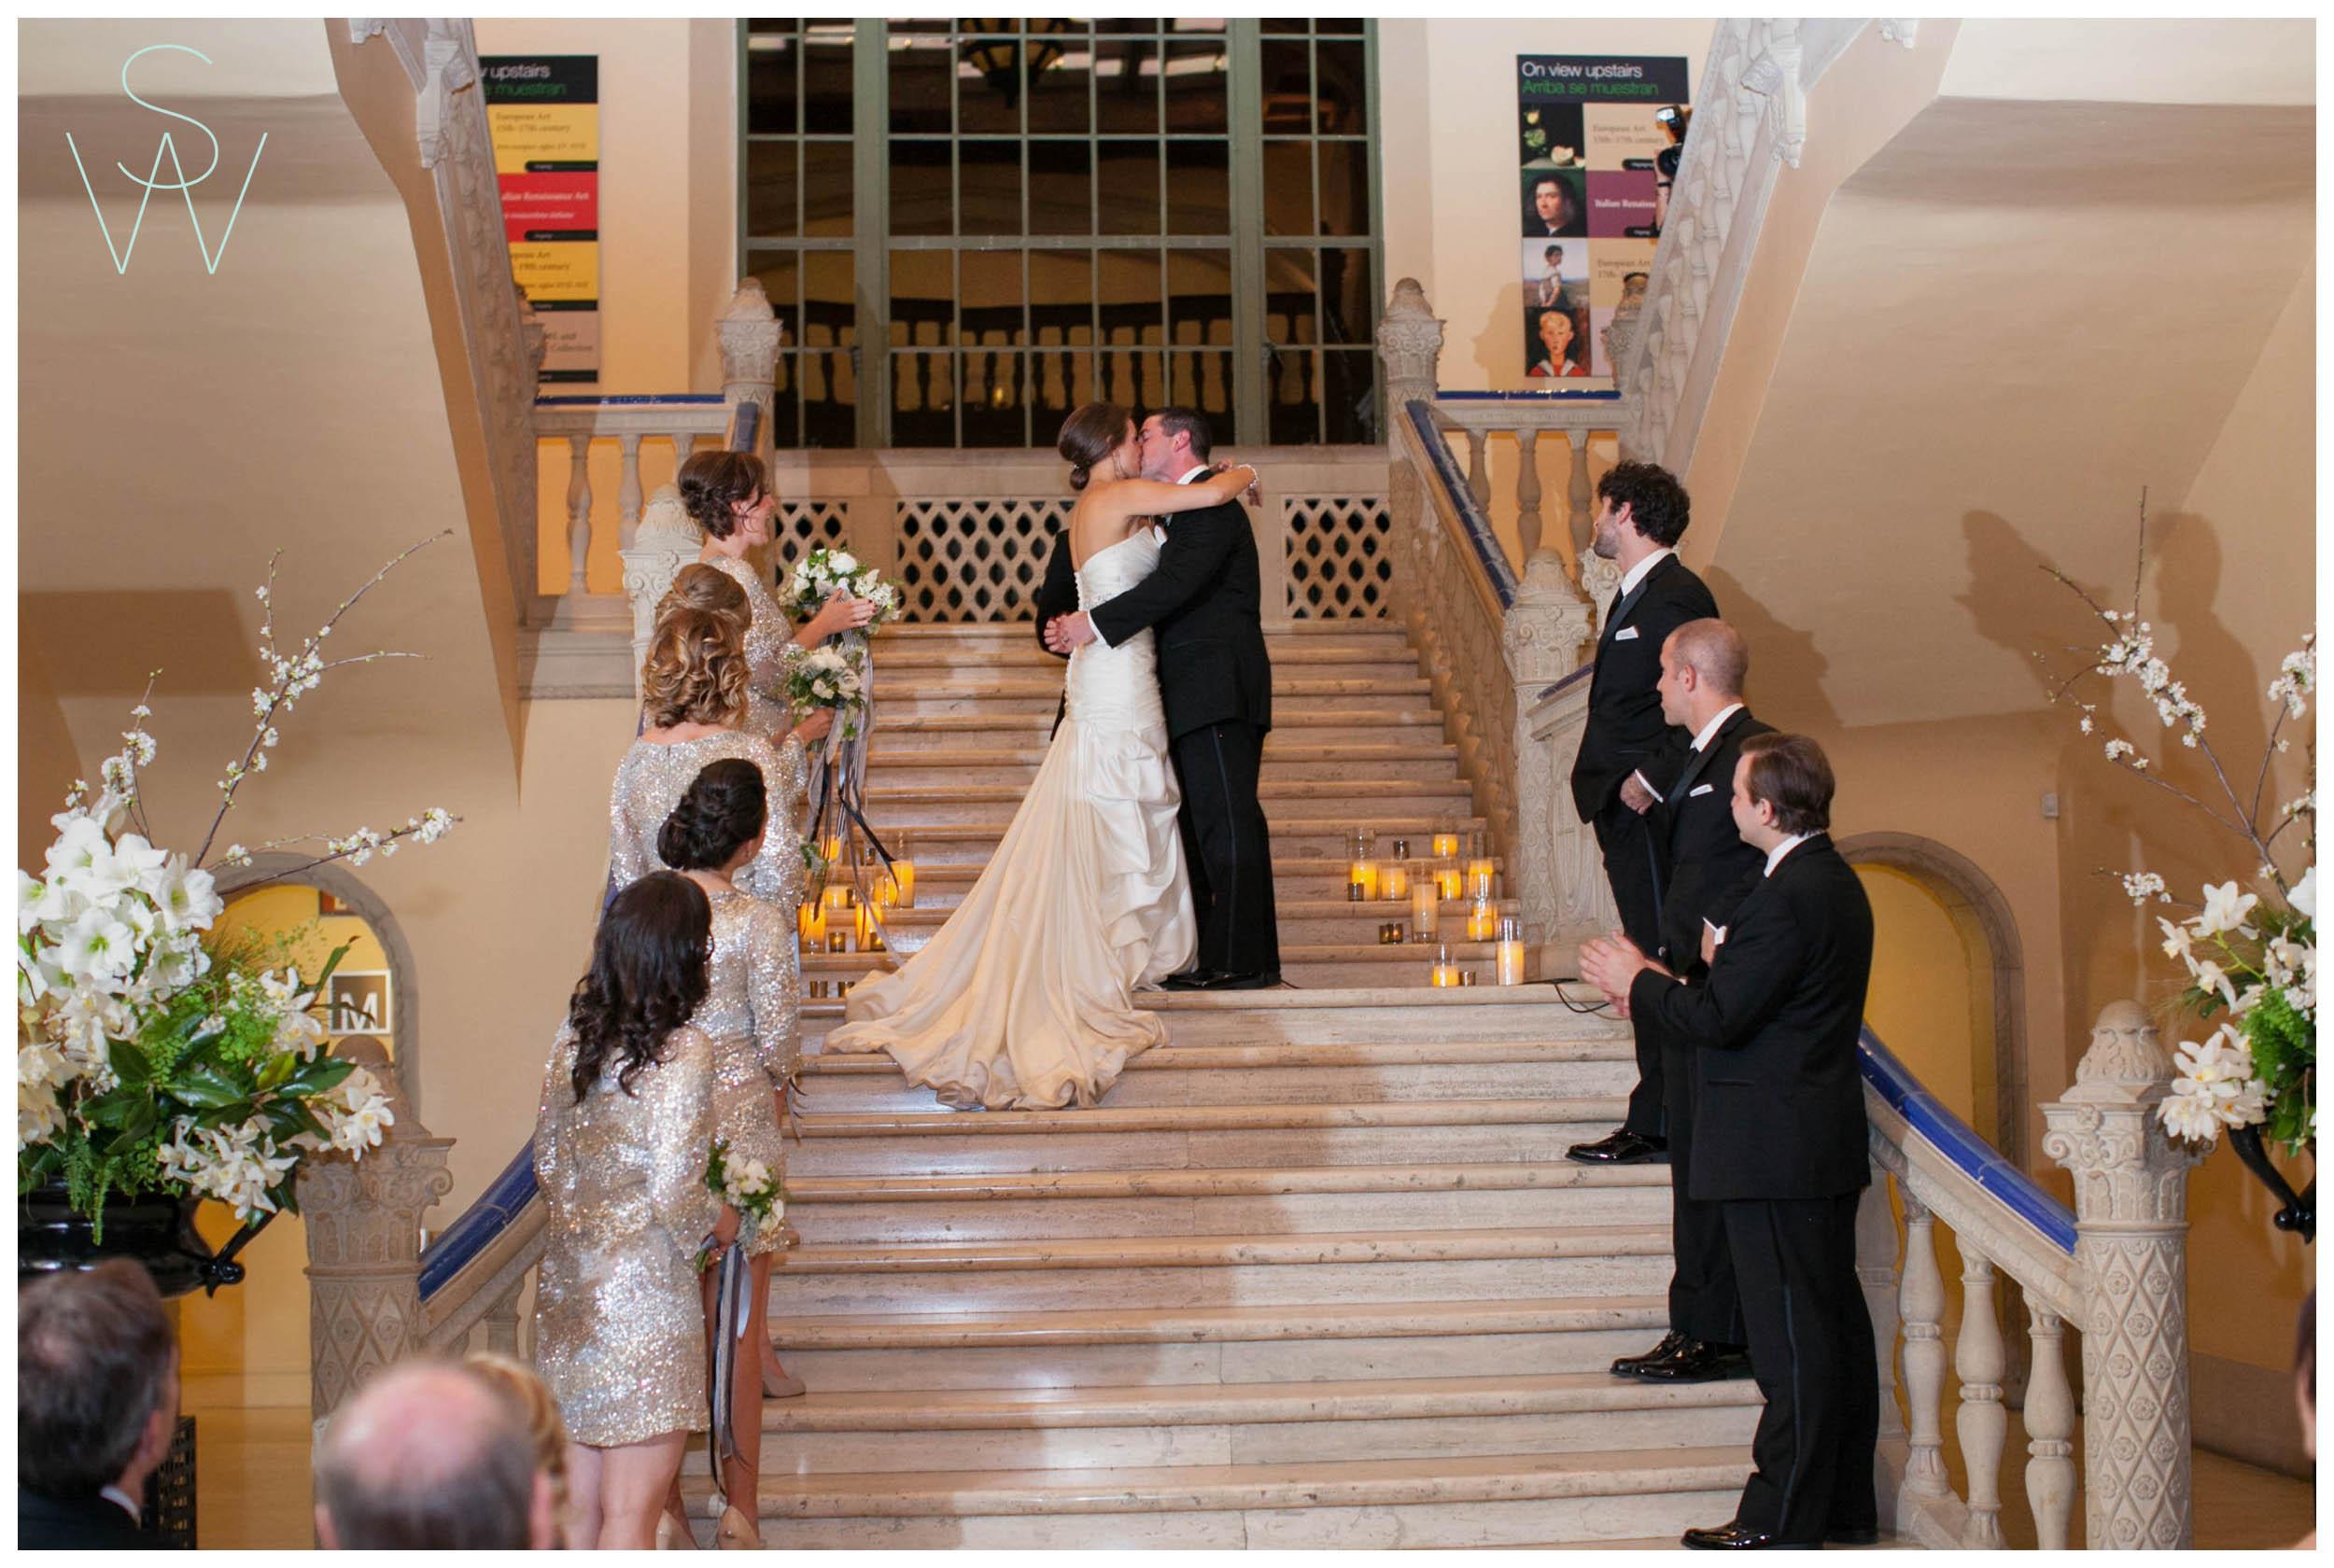 Shewanders.sdma_.wedding.photography-1054.jpg.wedding.photography-1054.jpg